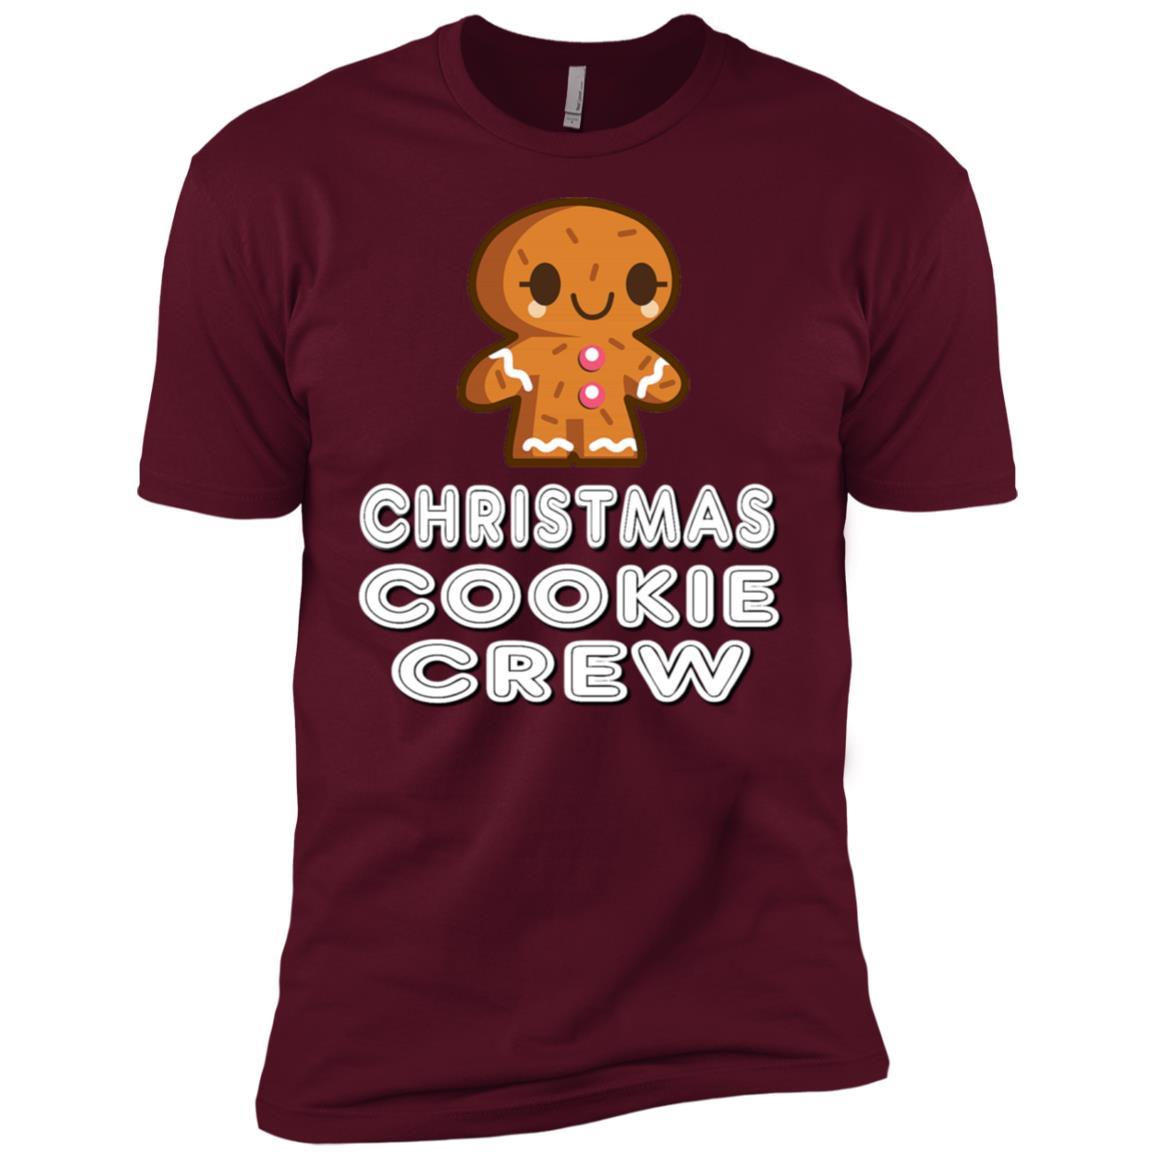 Christmas Baking Team Pajama Cookie Crew -5 Men Short Sleeve T-Shirt